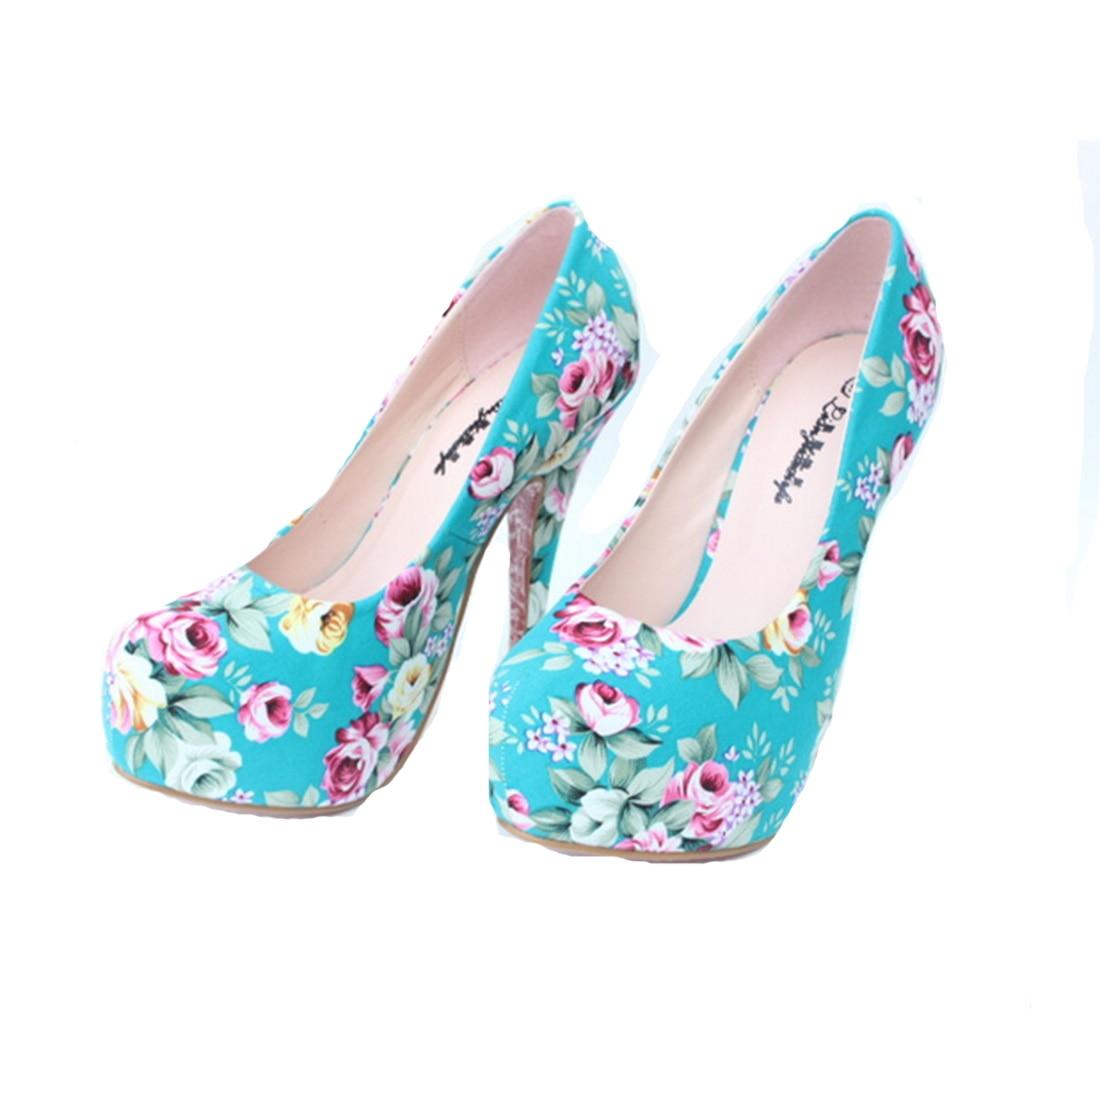 ФОТО Women Pumps 2017 Hot Vintage Floral Print High Heels Women Party Wedding Shoes High Heels Platform Shoes Woman plus size 32-43